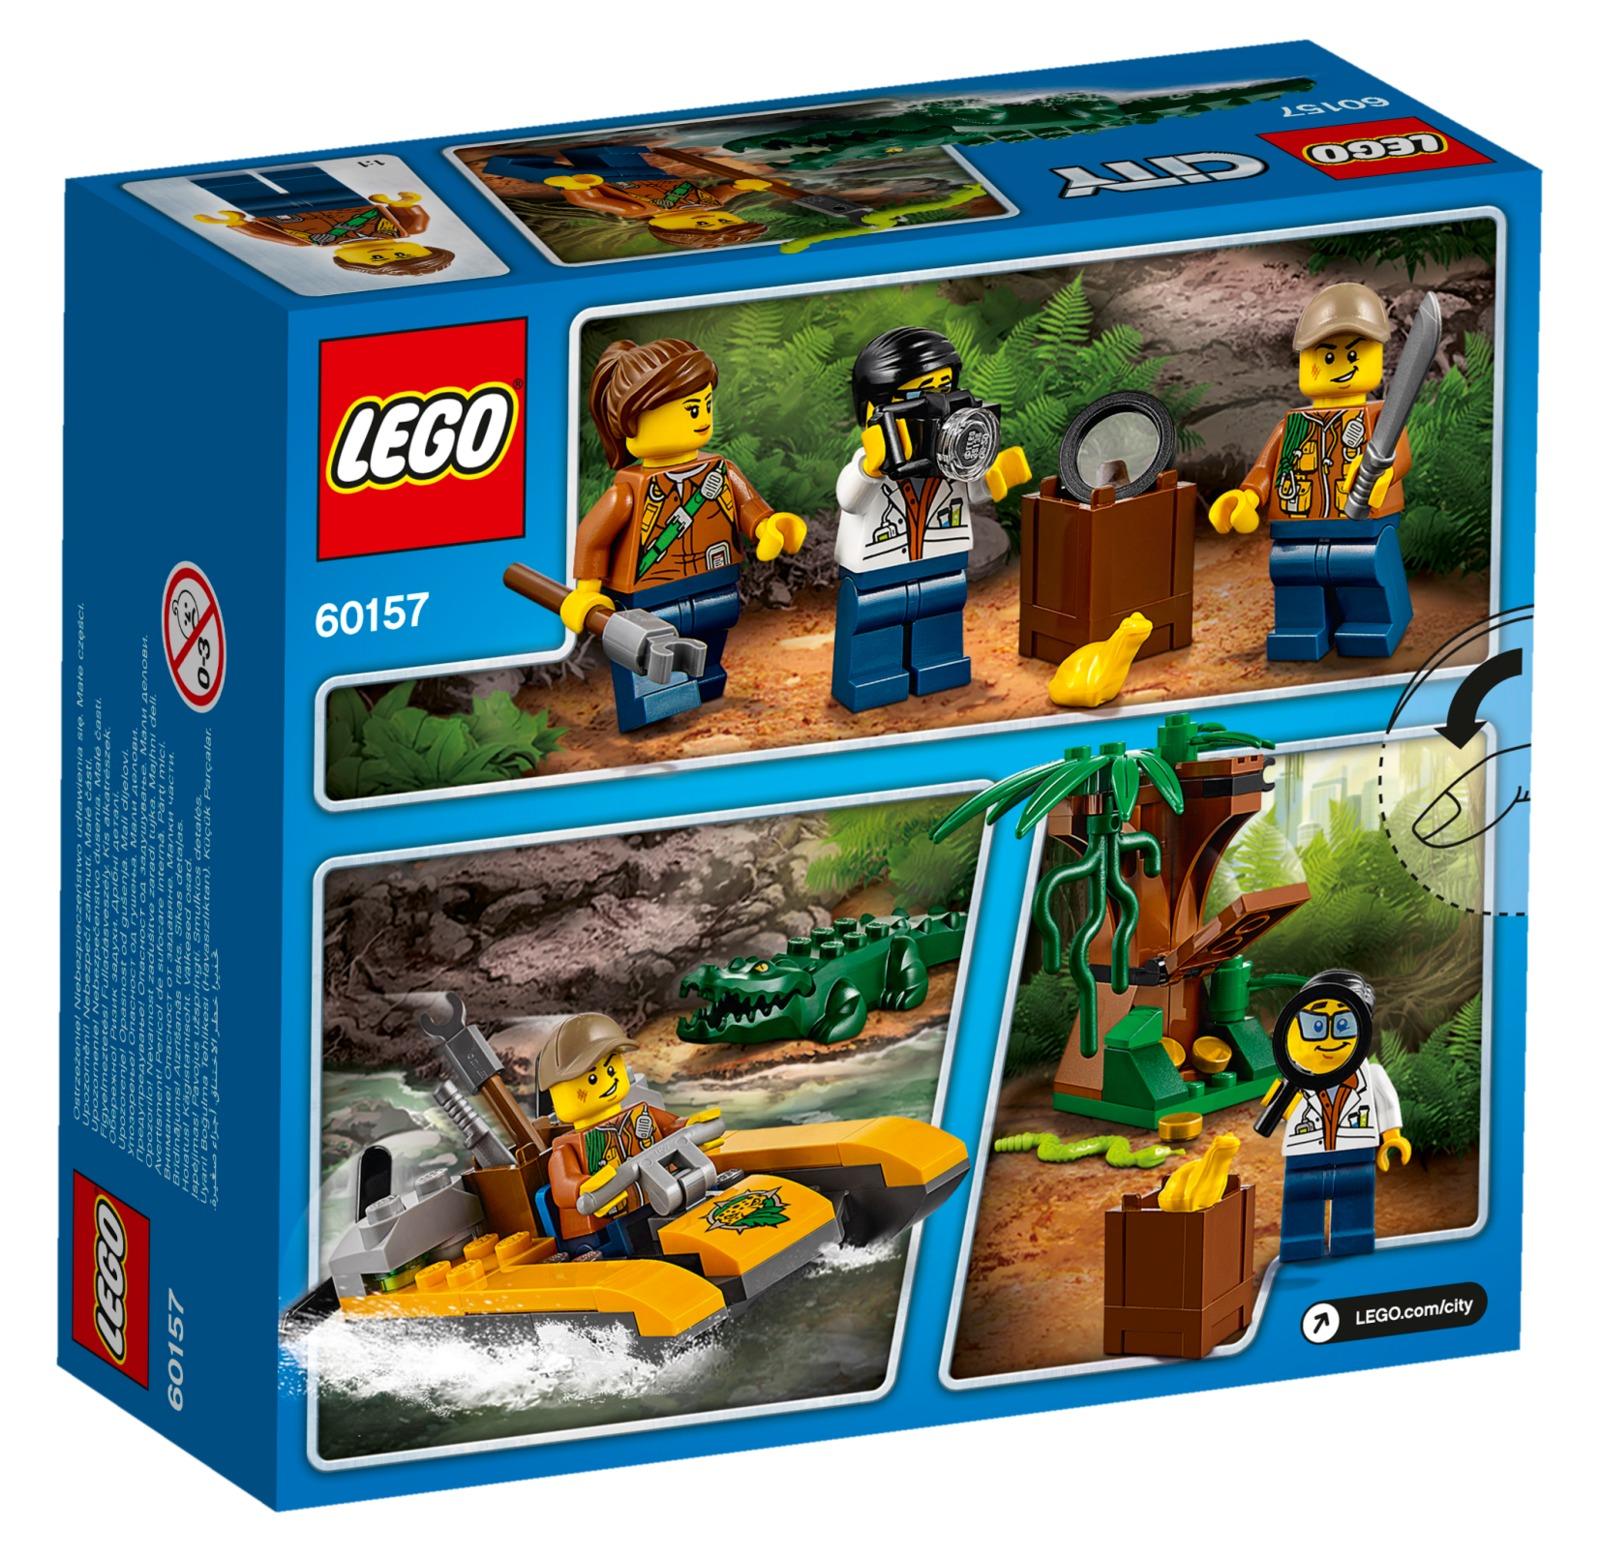 LEGO City: Jungle Starter Set (60157) | Toy | at Mighty Ape NZ